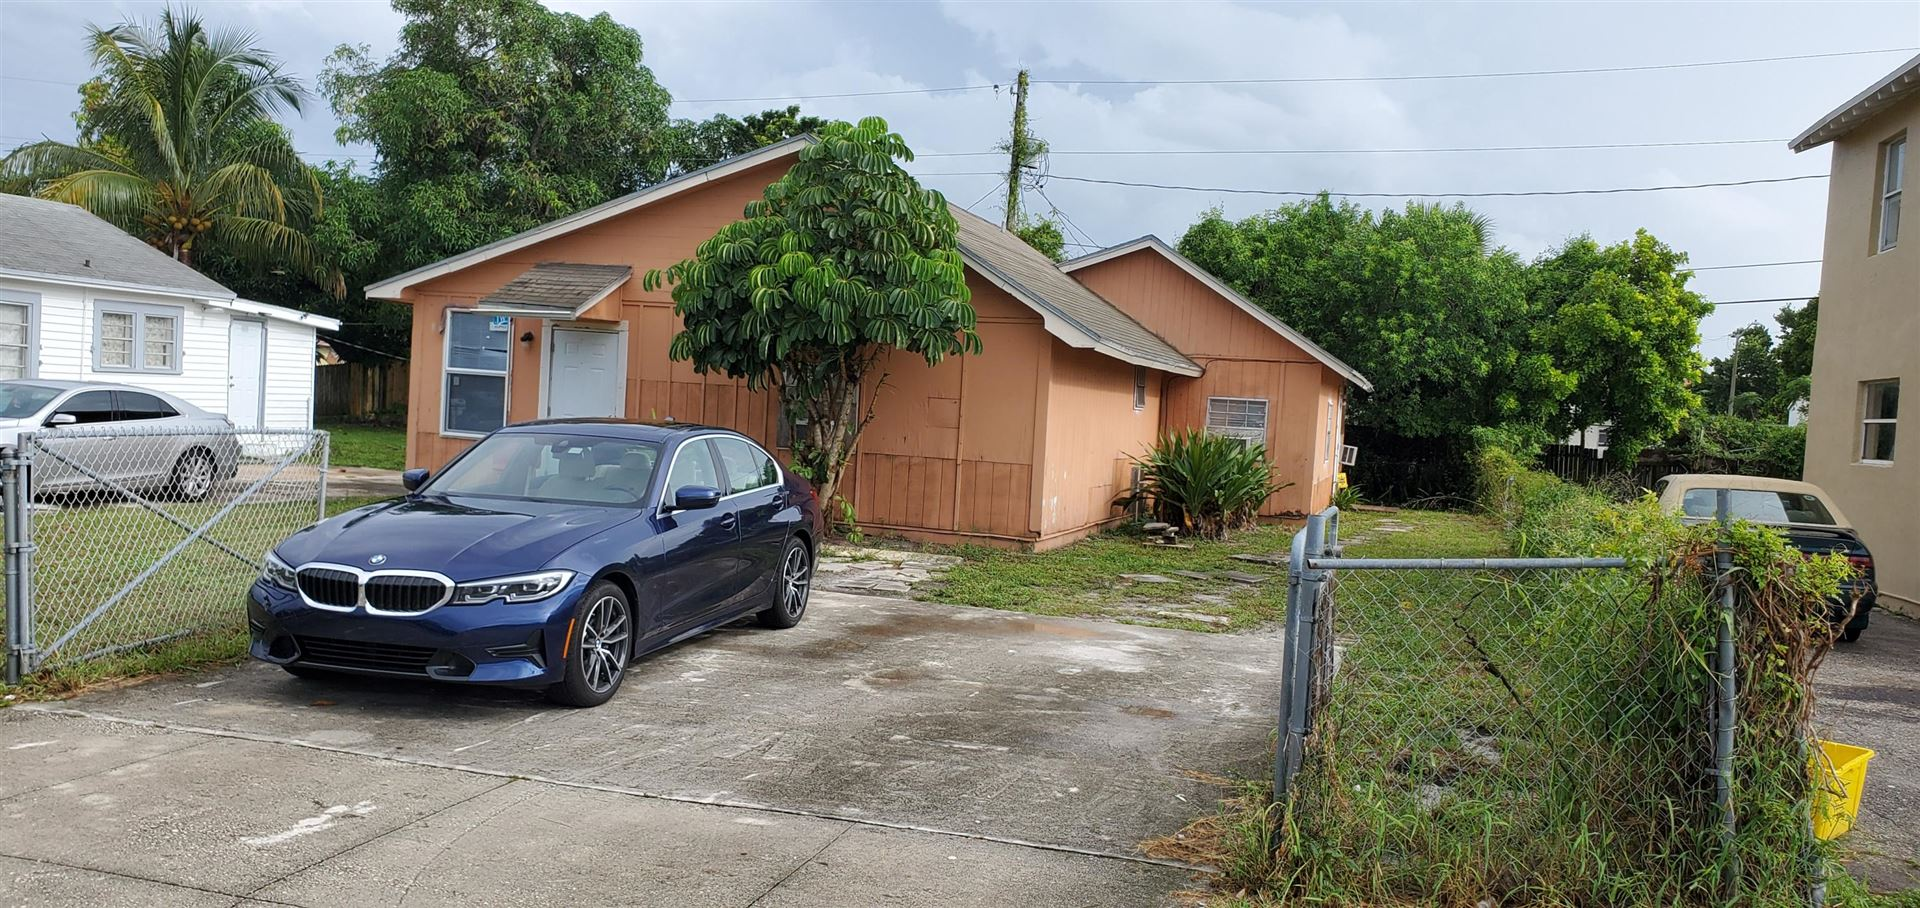 732 43rd Street, West Palm Beach, FL 33407 - #: RX-10644122